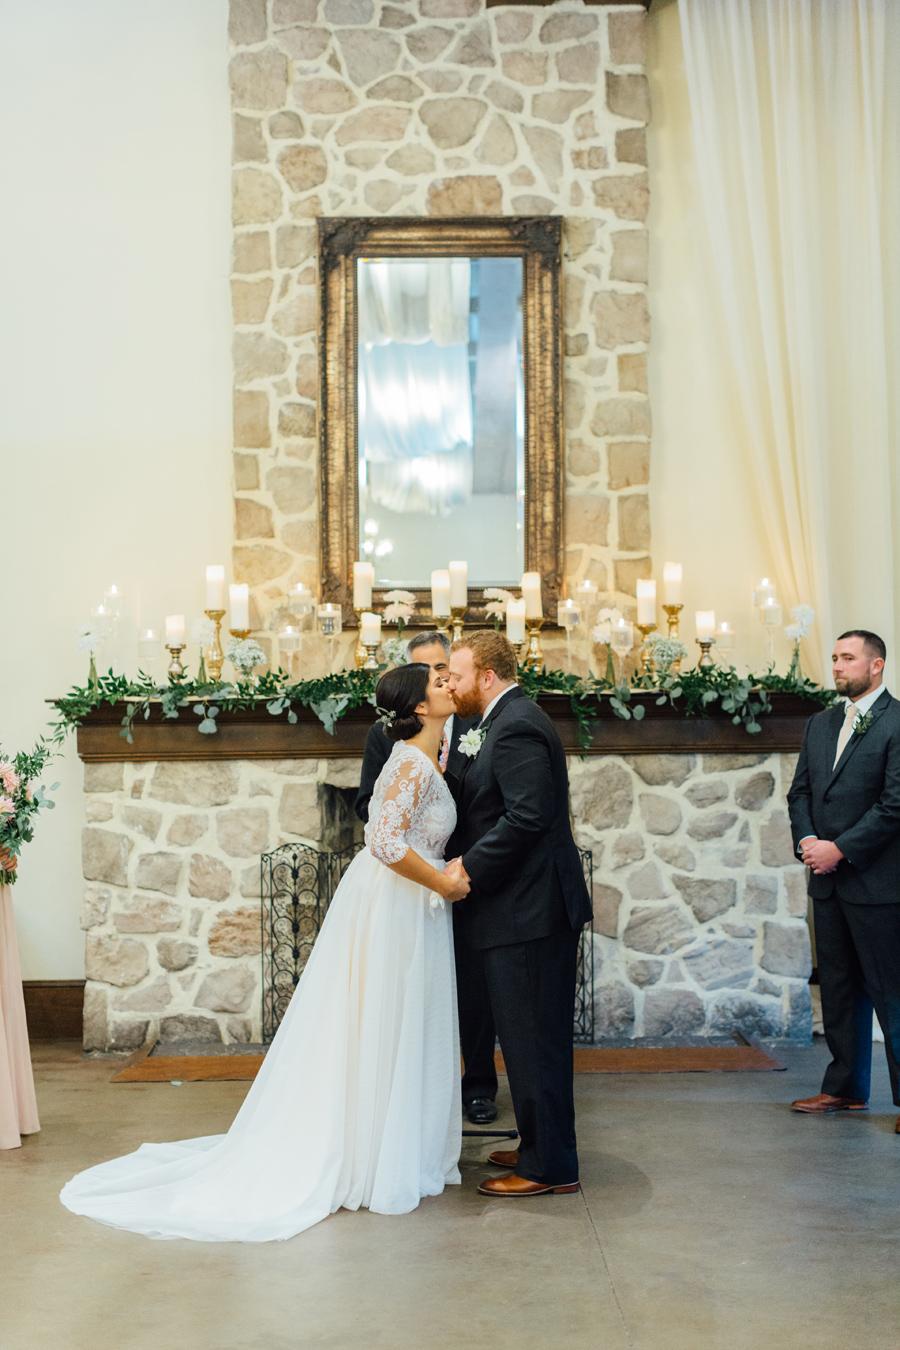 the-inn-at-leola-wedding-lancaster-pennsylvania-wedding-photographer-rebeka-viola-photograhy (61).jpg